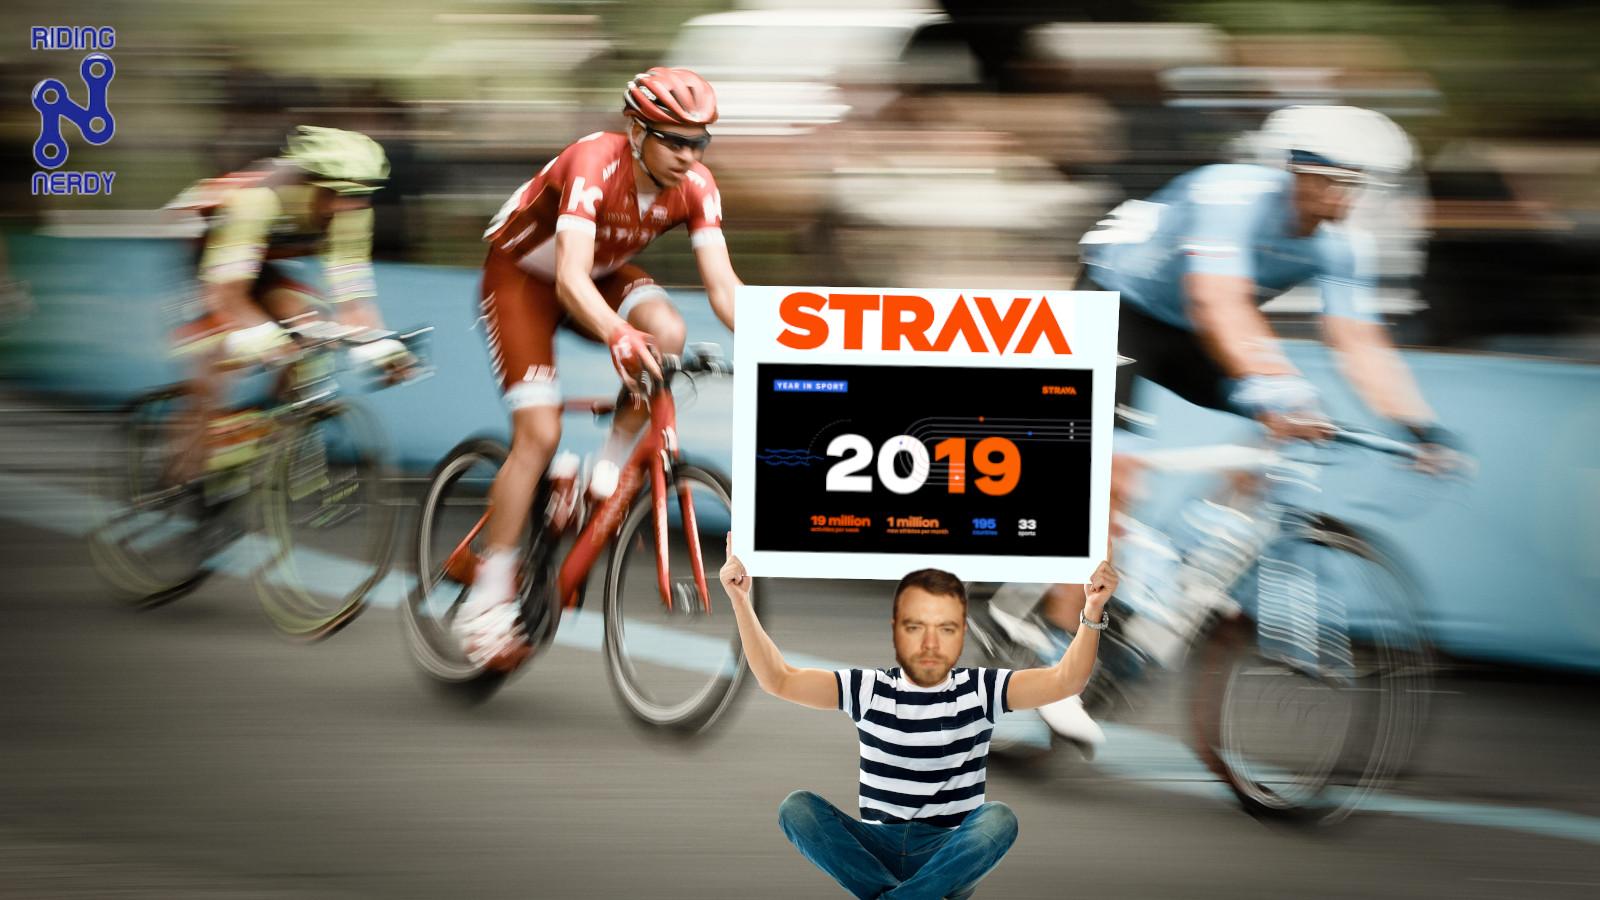 Strava's Year in Sport highlights astounding human achievements